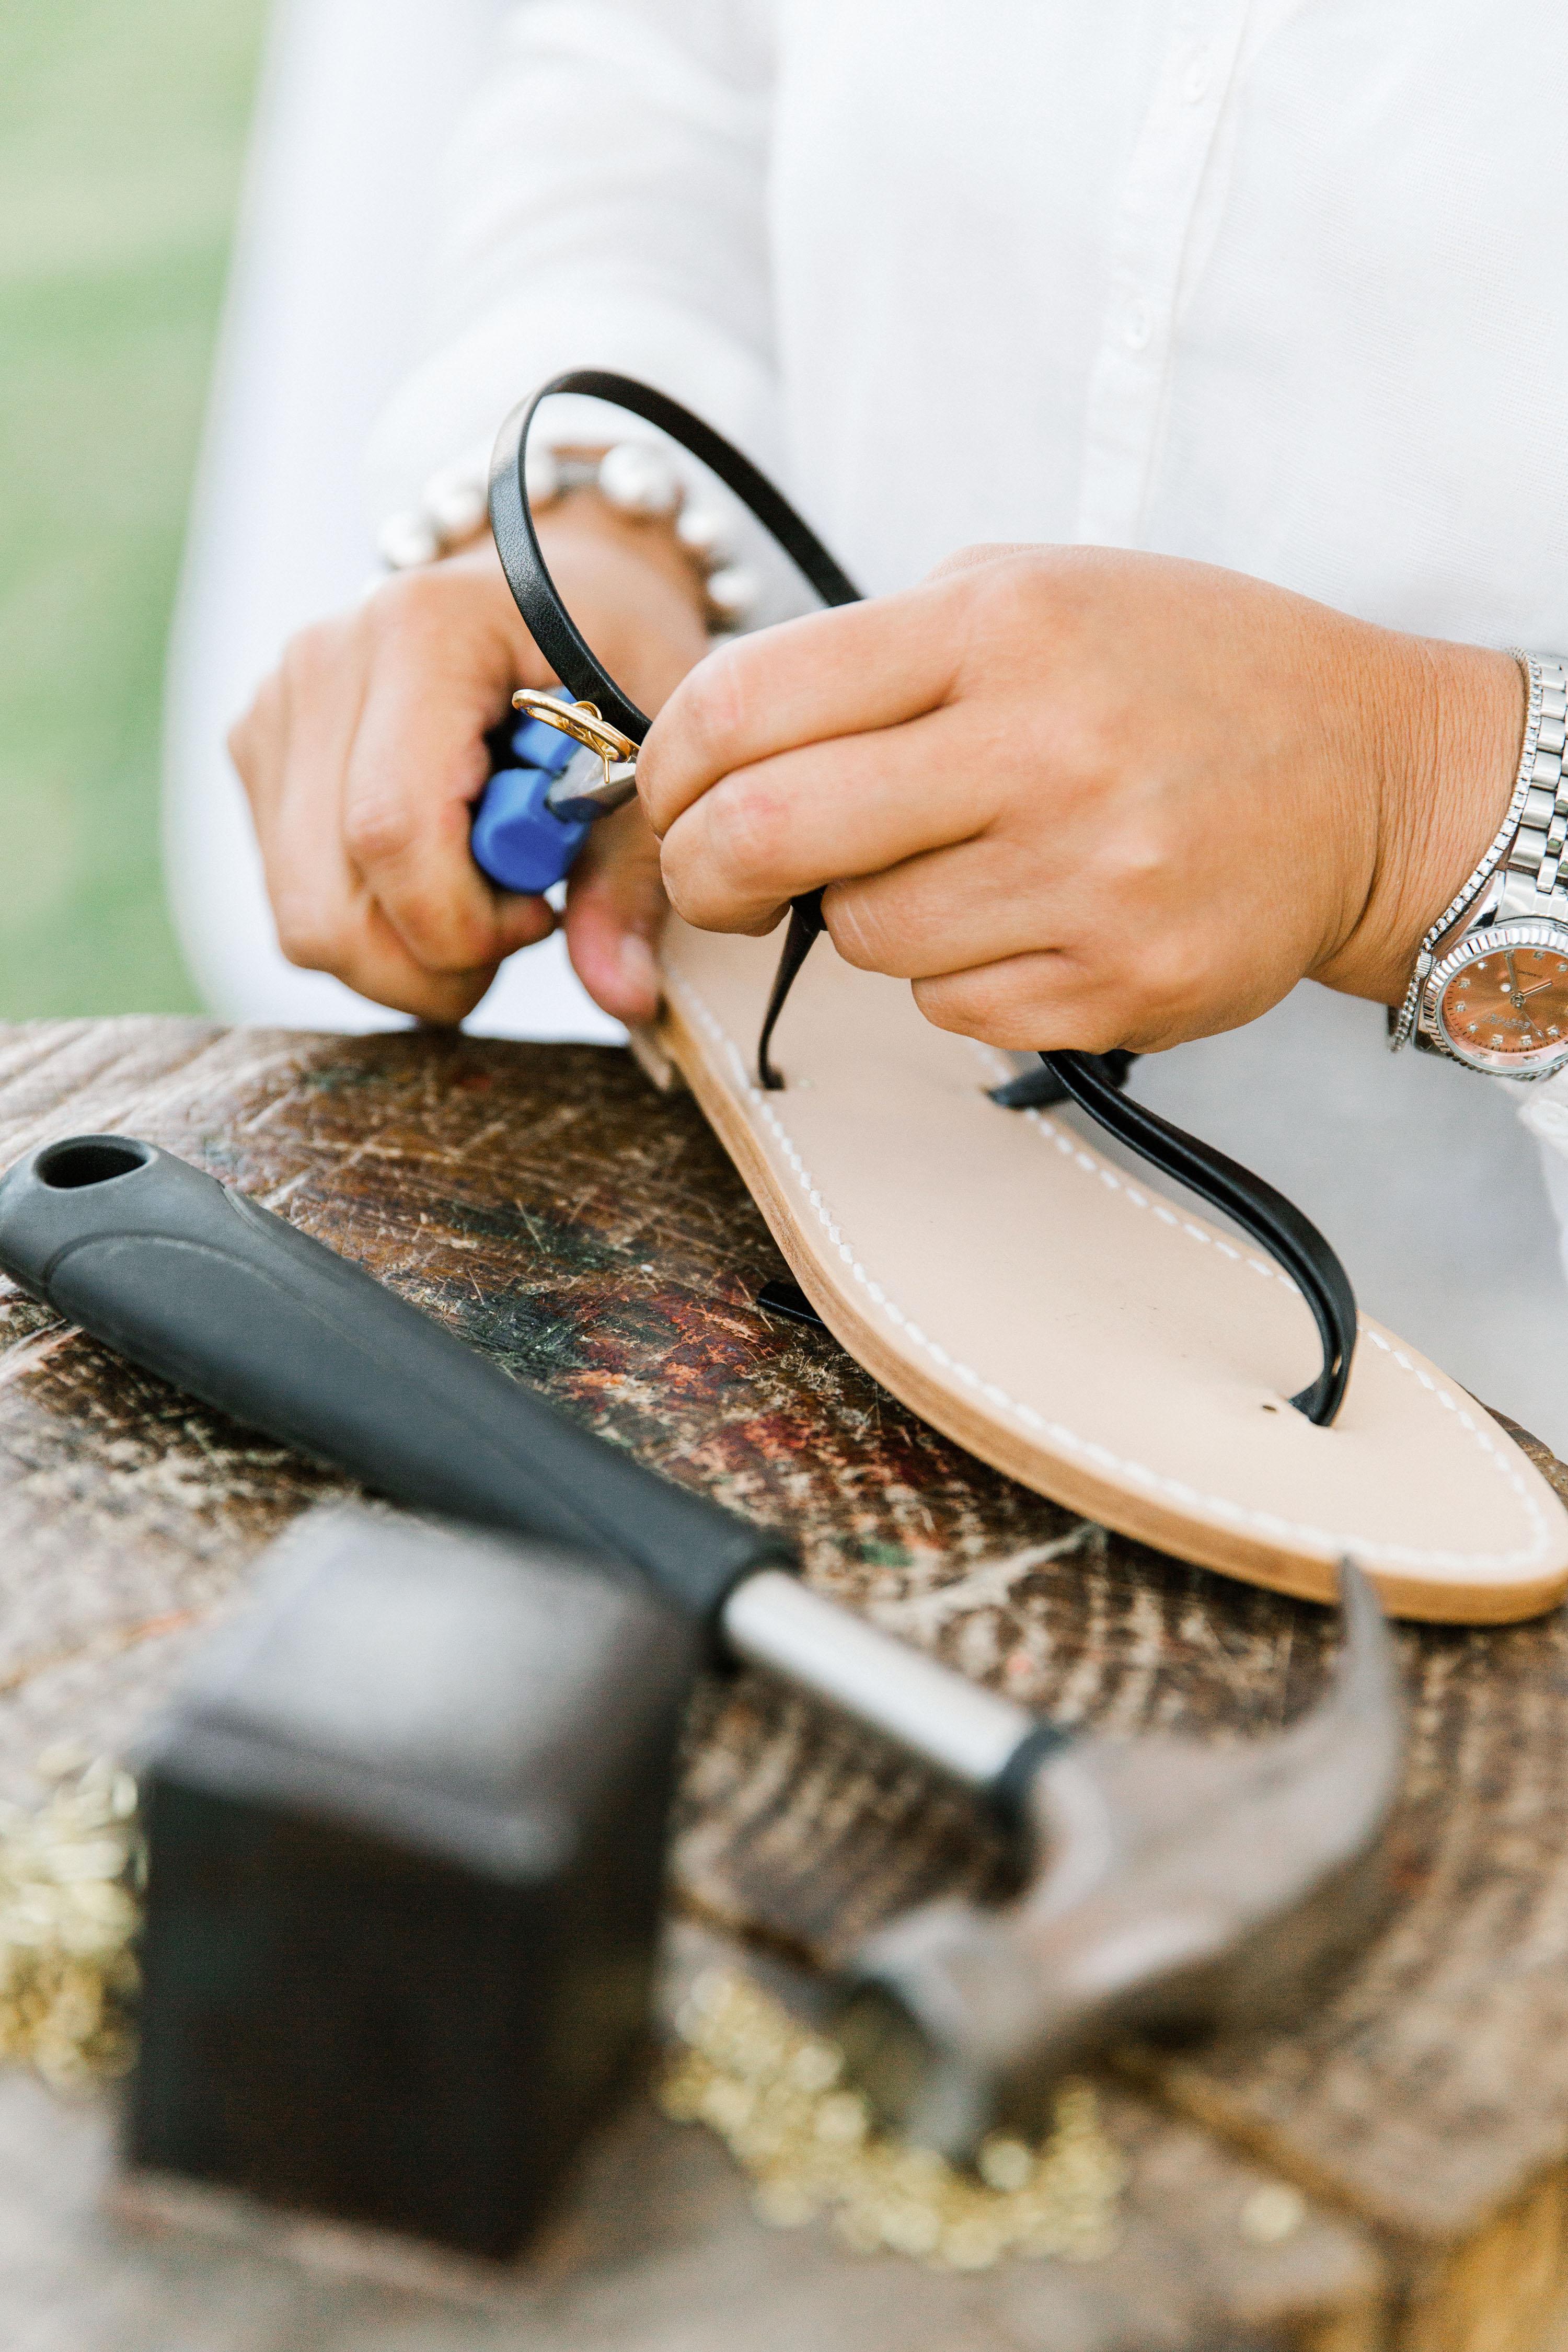 lisa greg italy wedding cobbler shoes fix repair